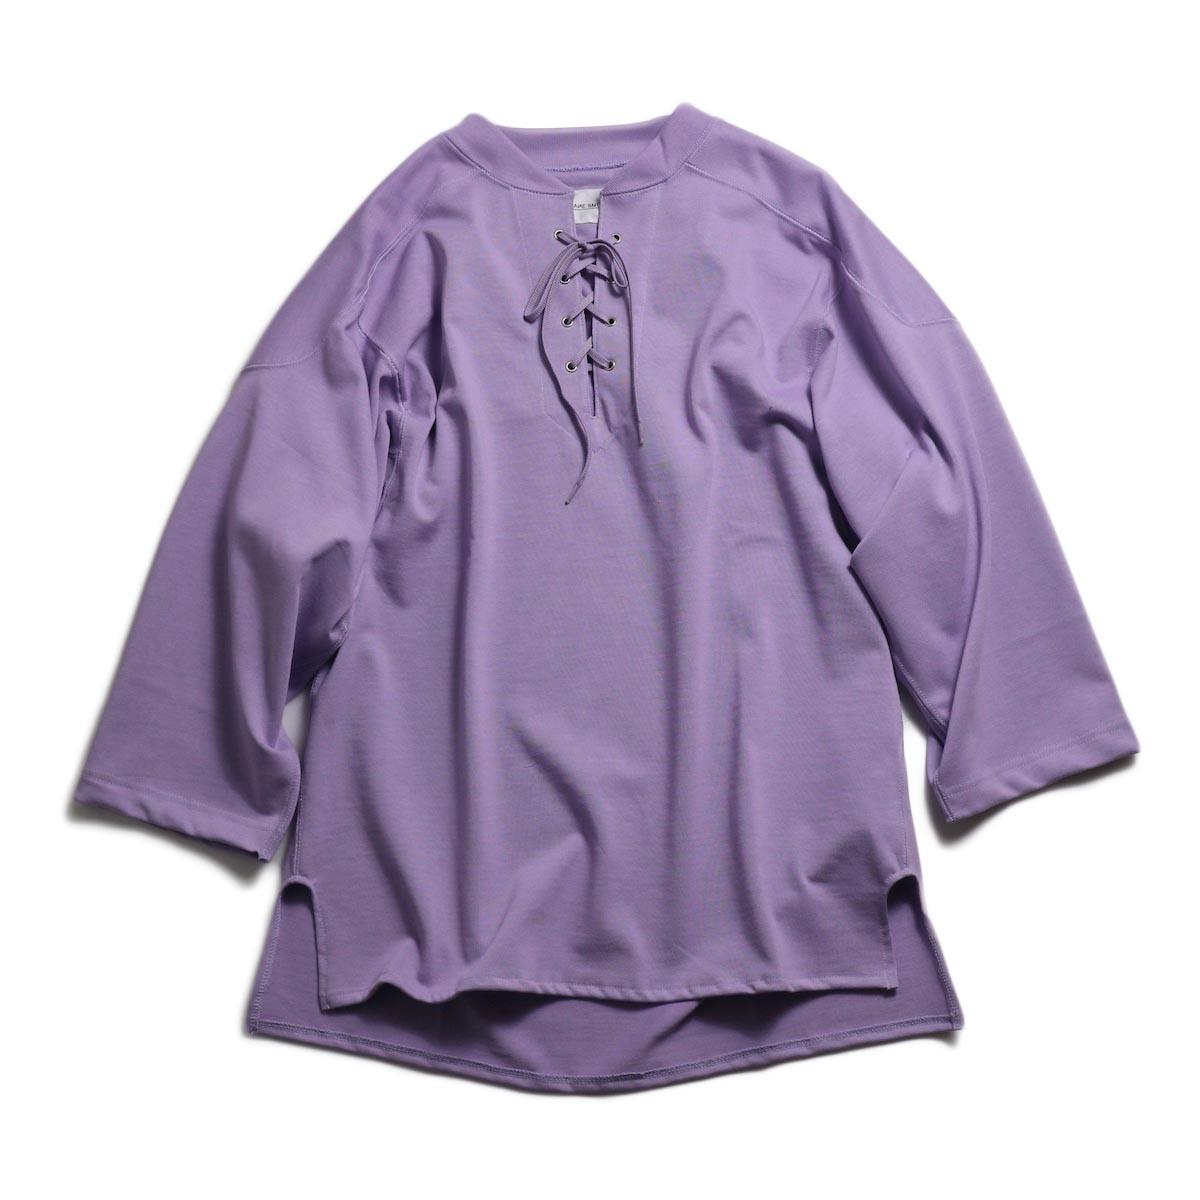 JANE SMITH / Lace Up Football -Purple